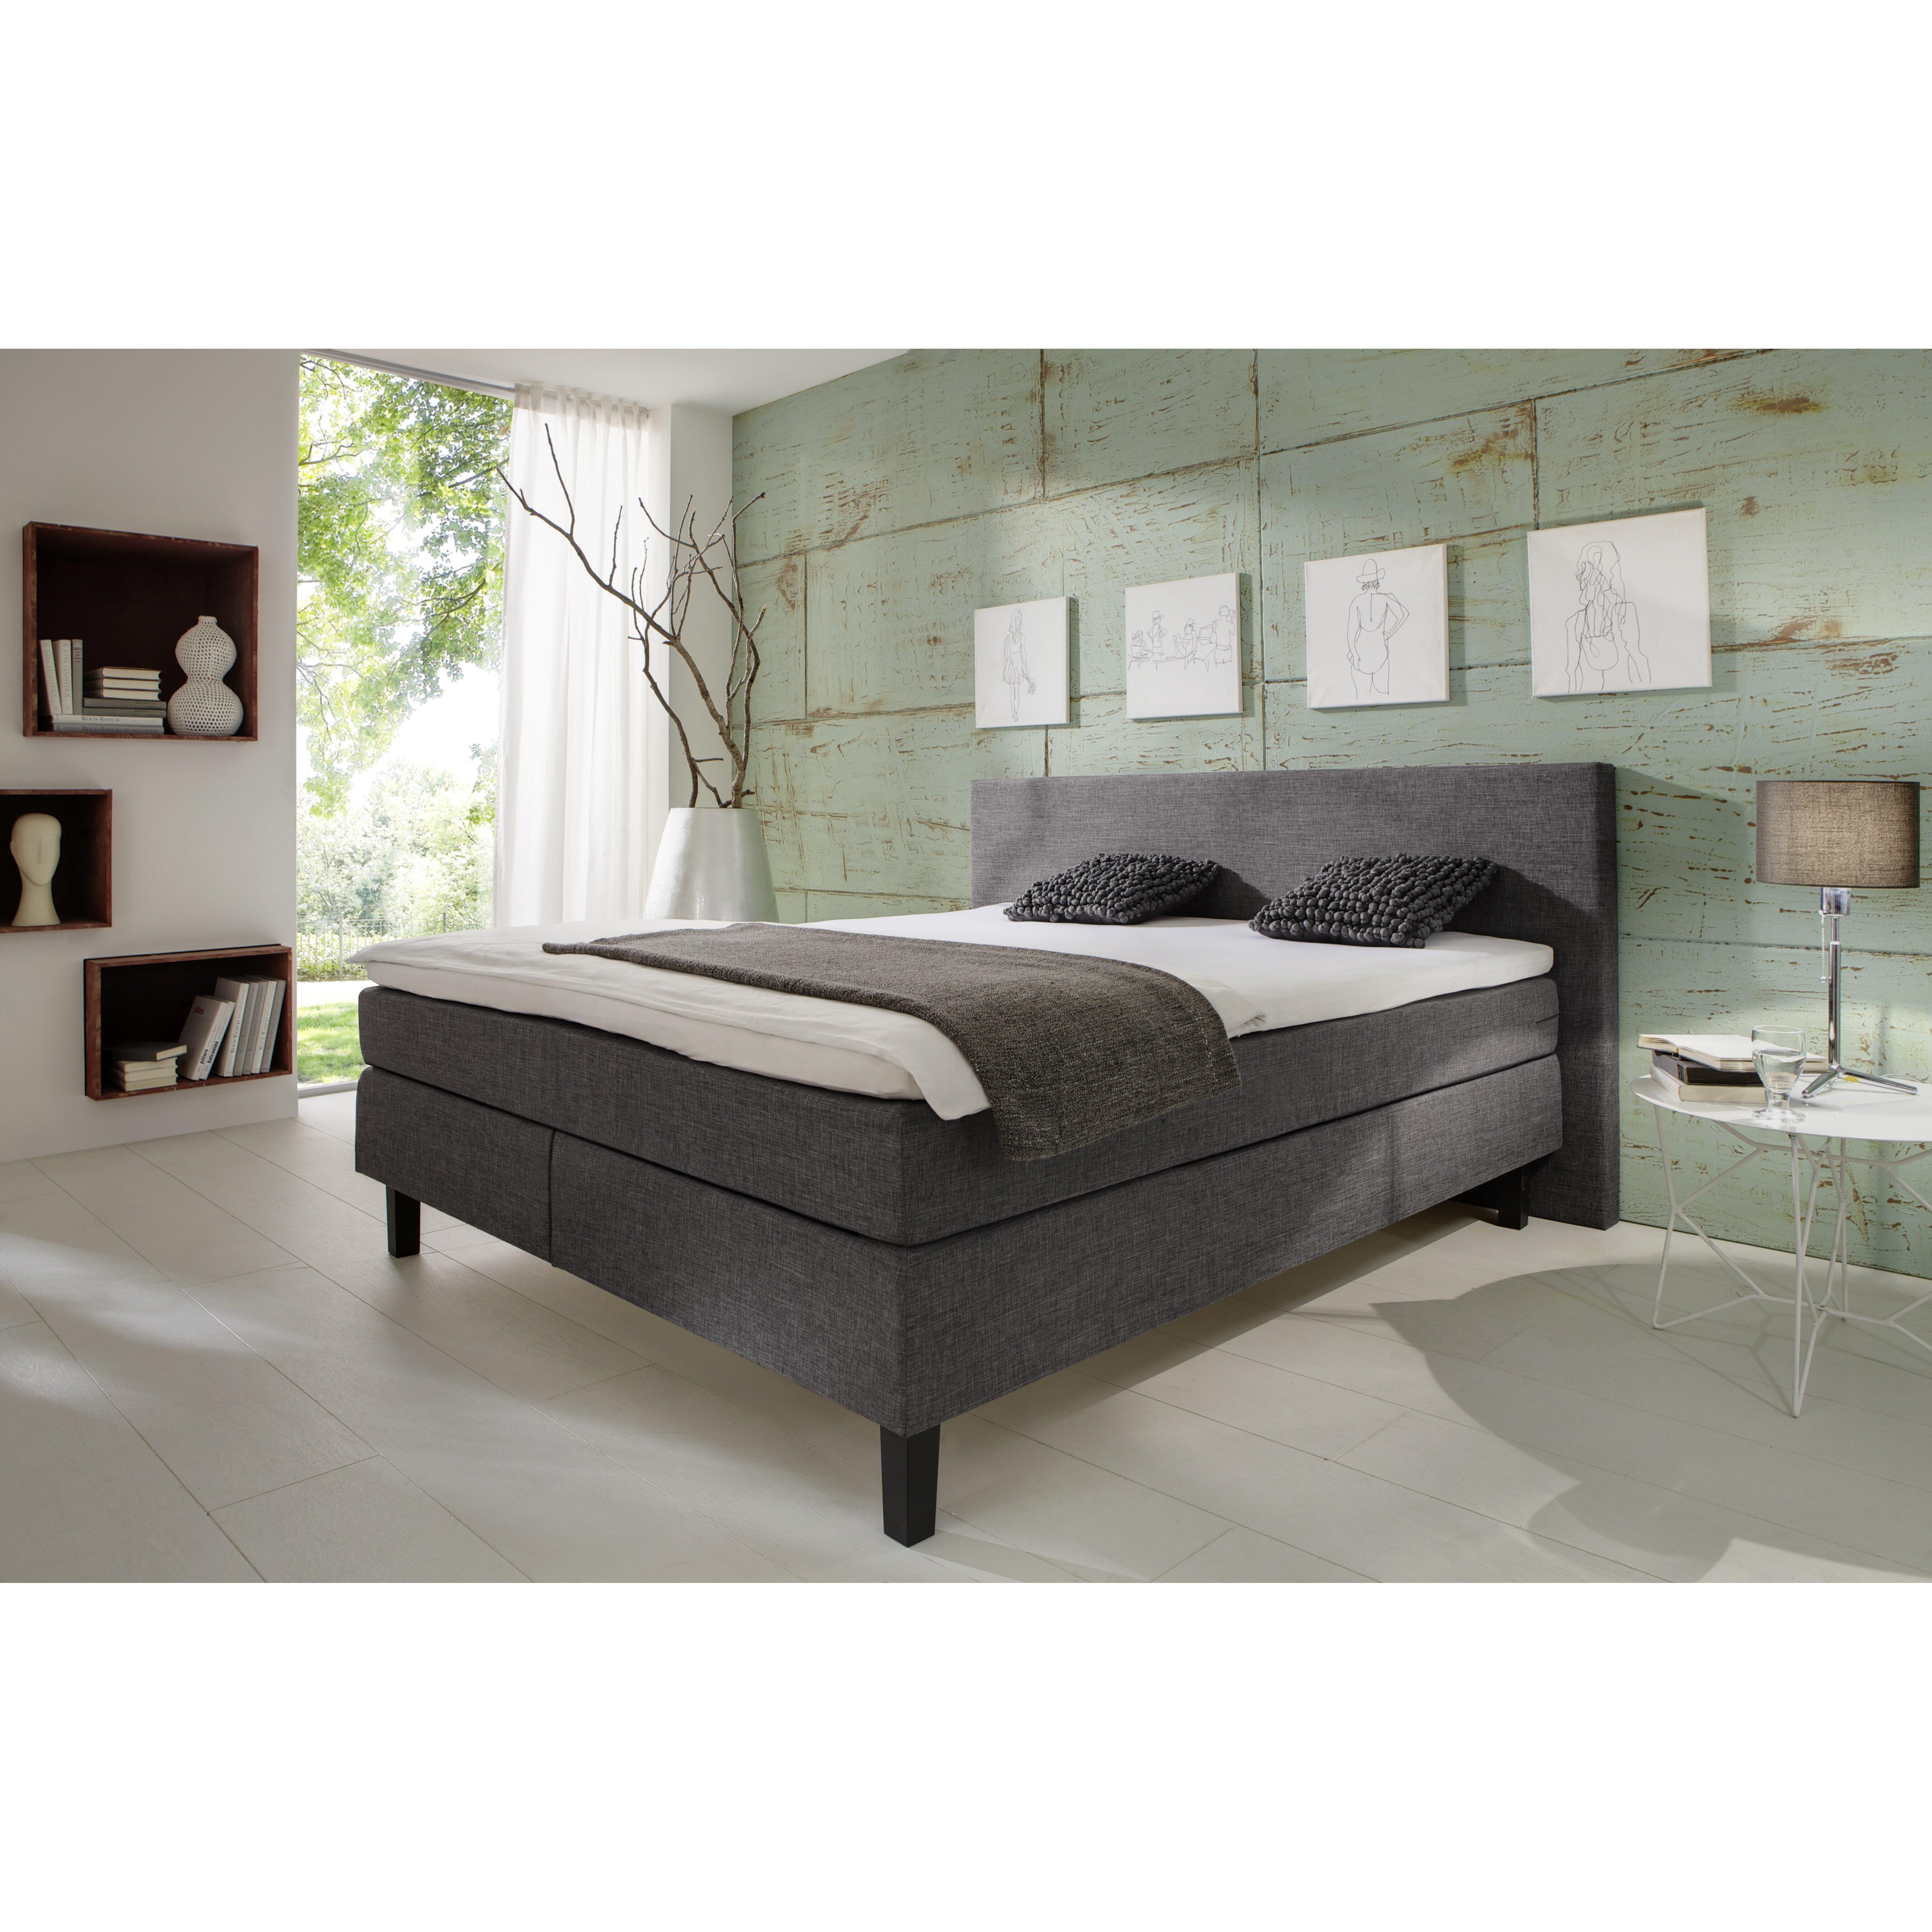 atlantic home collection boxspringbett amrum mit topper. Black Bedroom Furniture Sets. Home Design Ideas